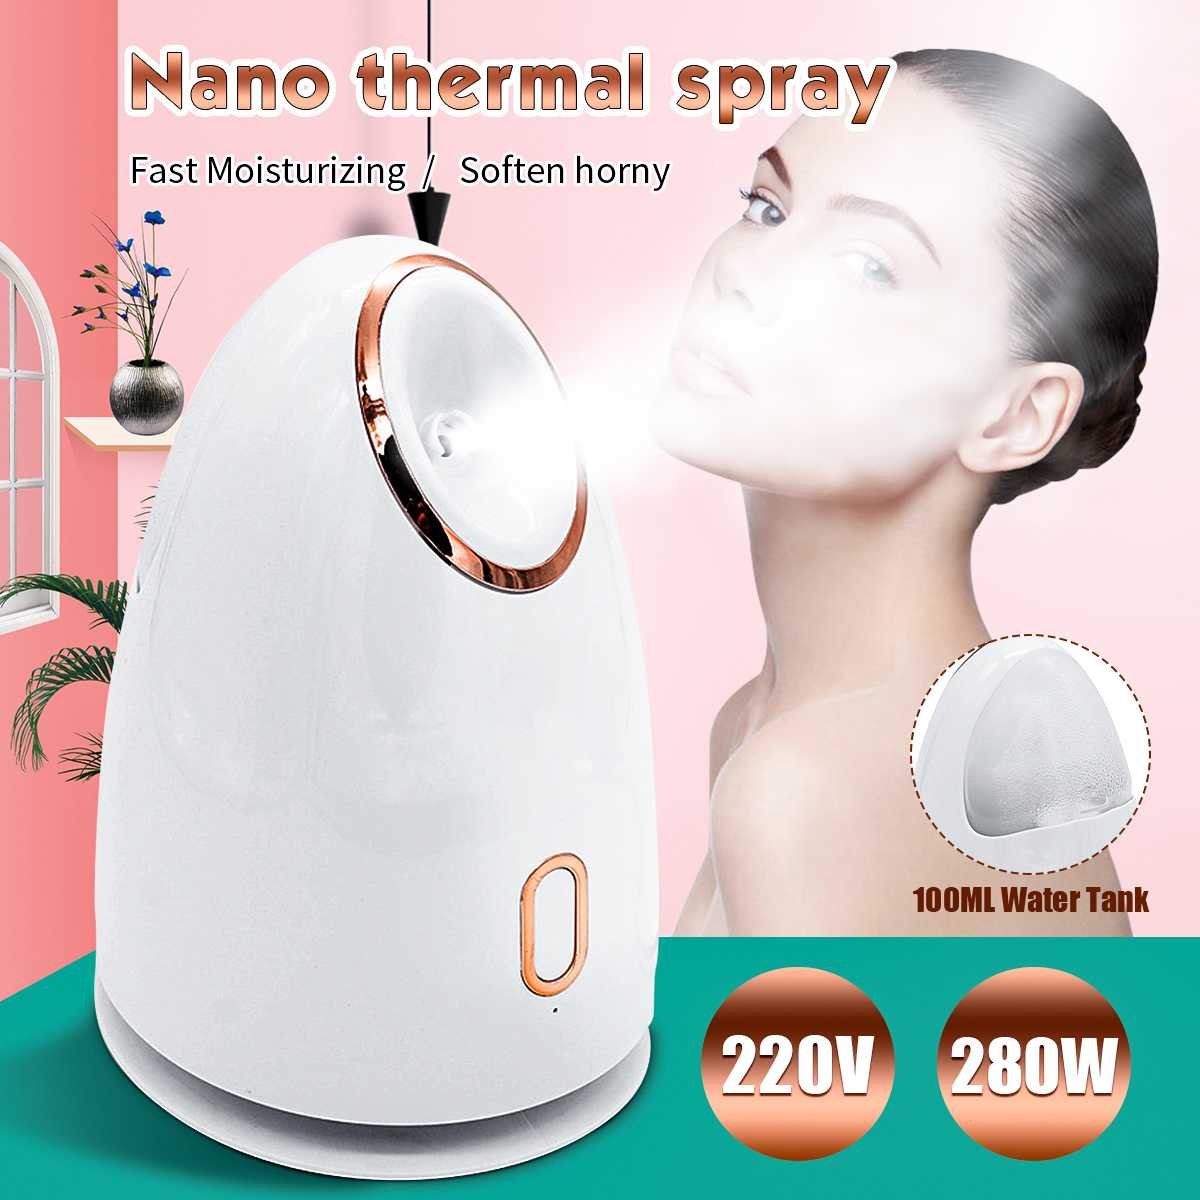 Deep Clean Facial Steamer Nano Ionic Face Steamer For Home Facial Steamer Sauna Spa Moisturizing Cleansing Pores Blackheads Acne